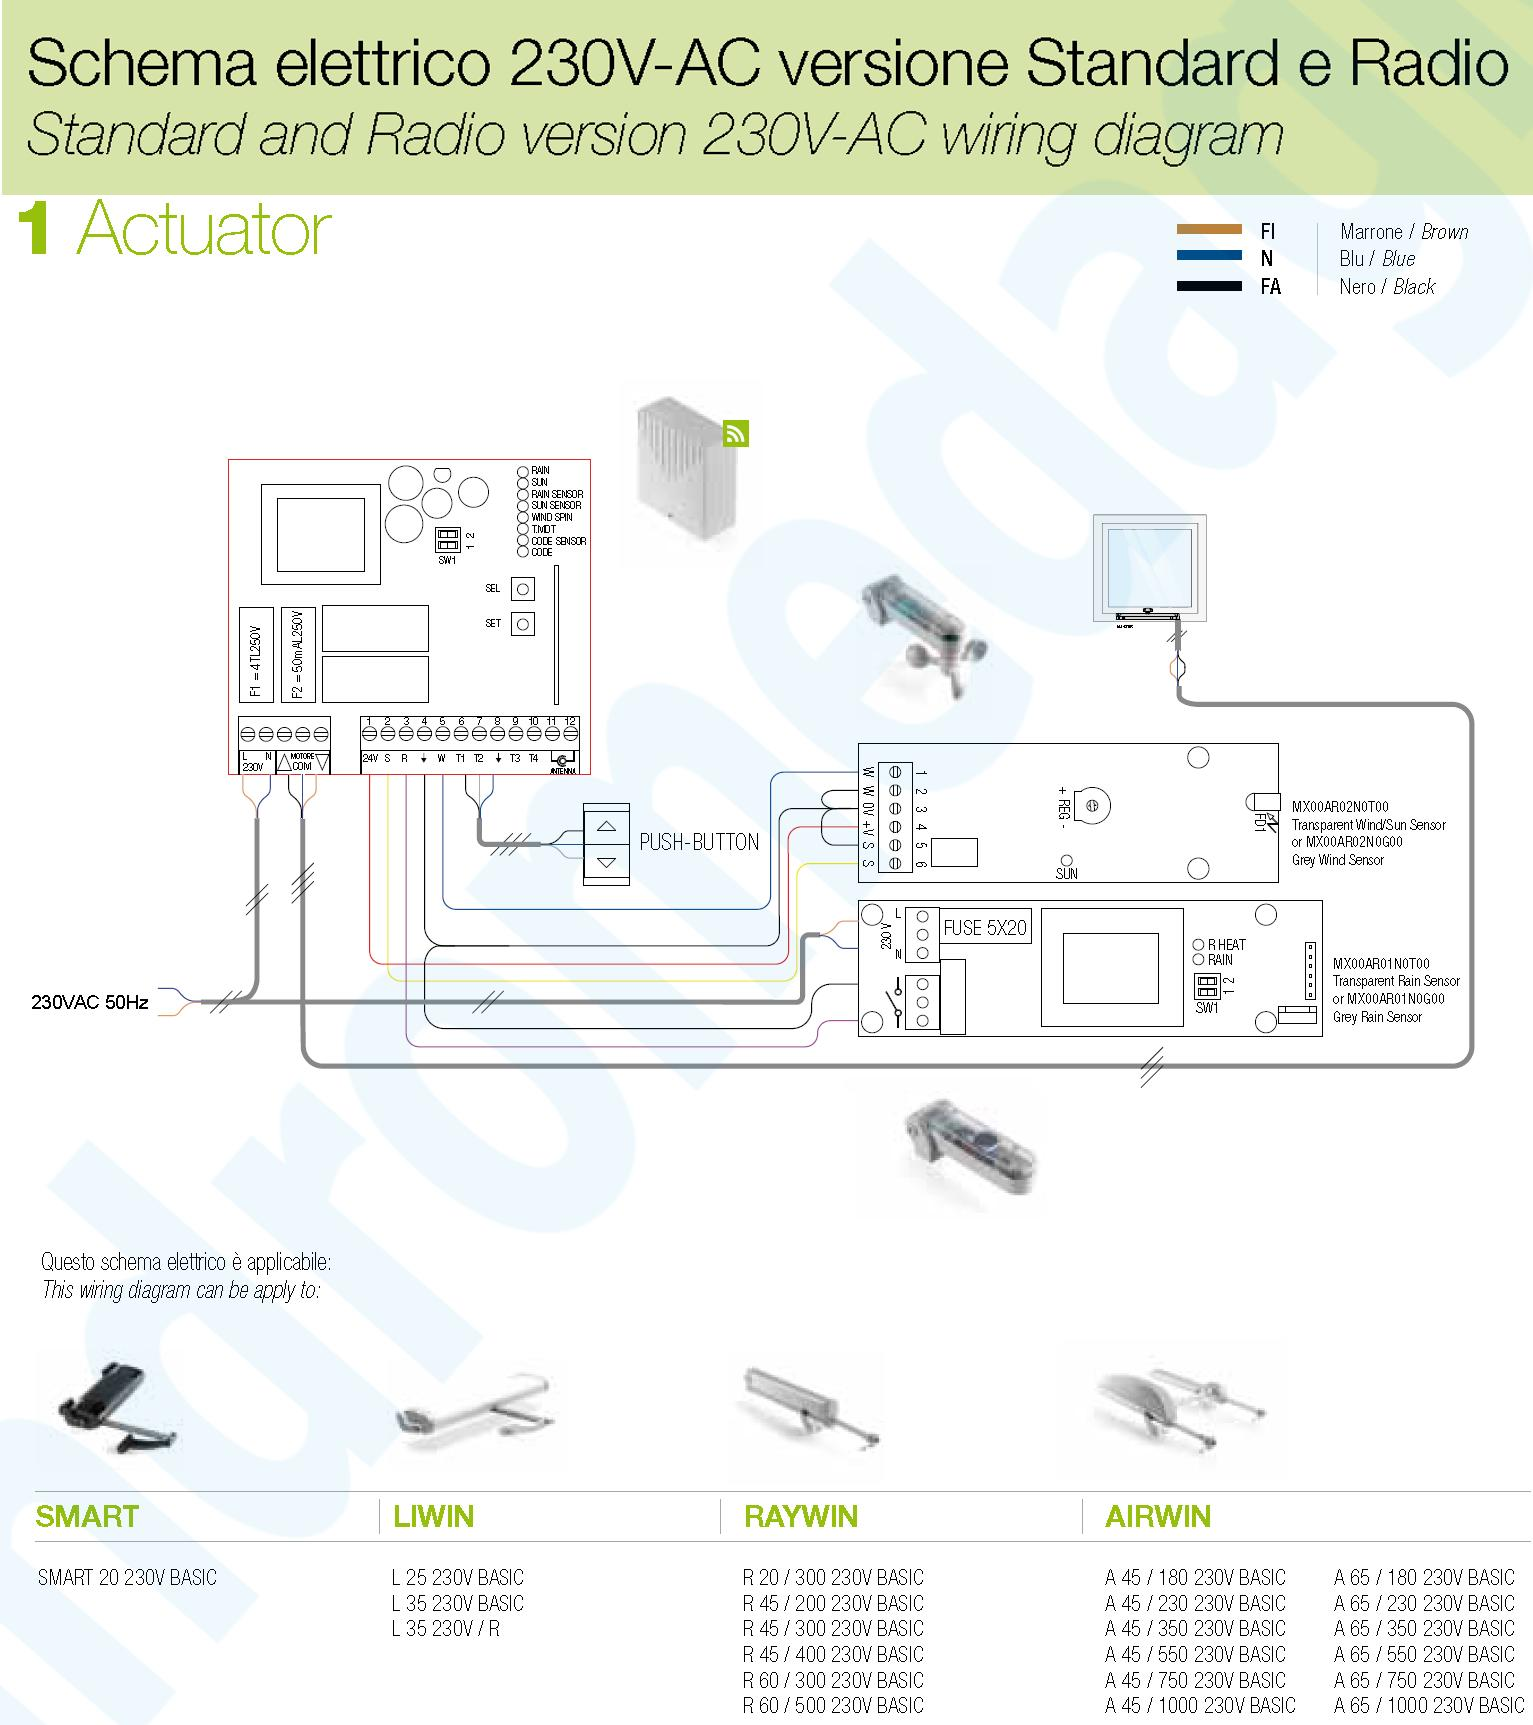 FAST 500N 230V C=200 MM + UNITA DI CONTROLLO RADIO 230V + R1 CONTROL BLU